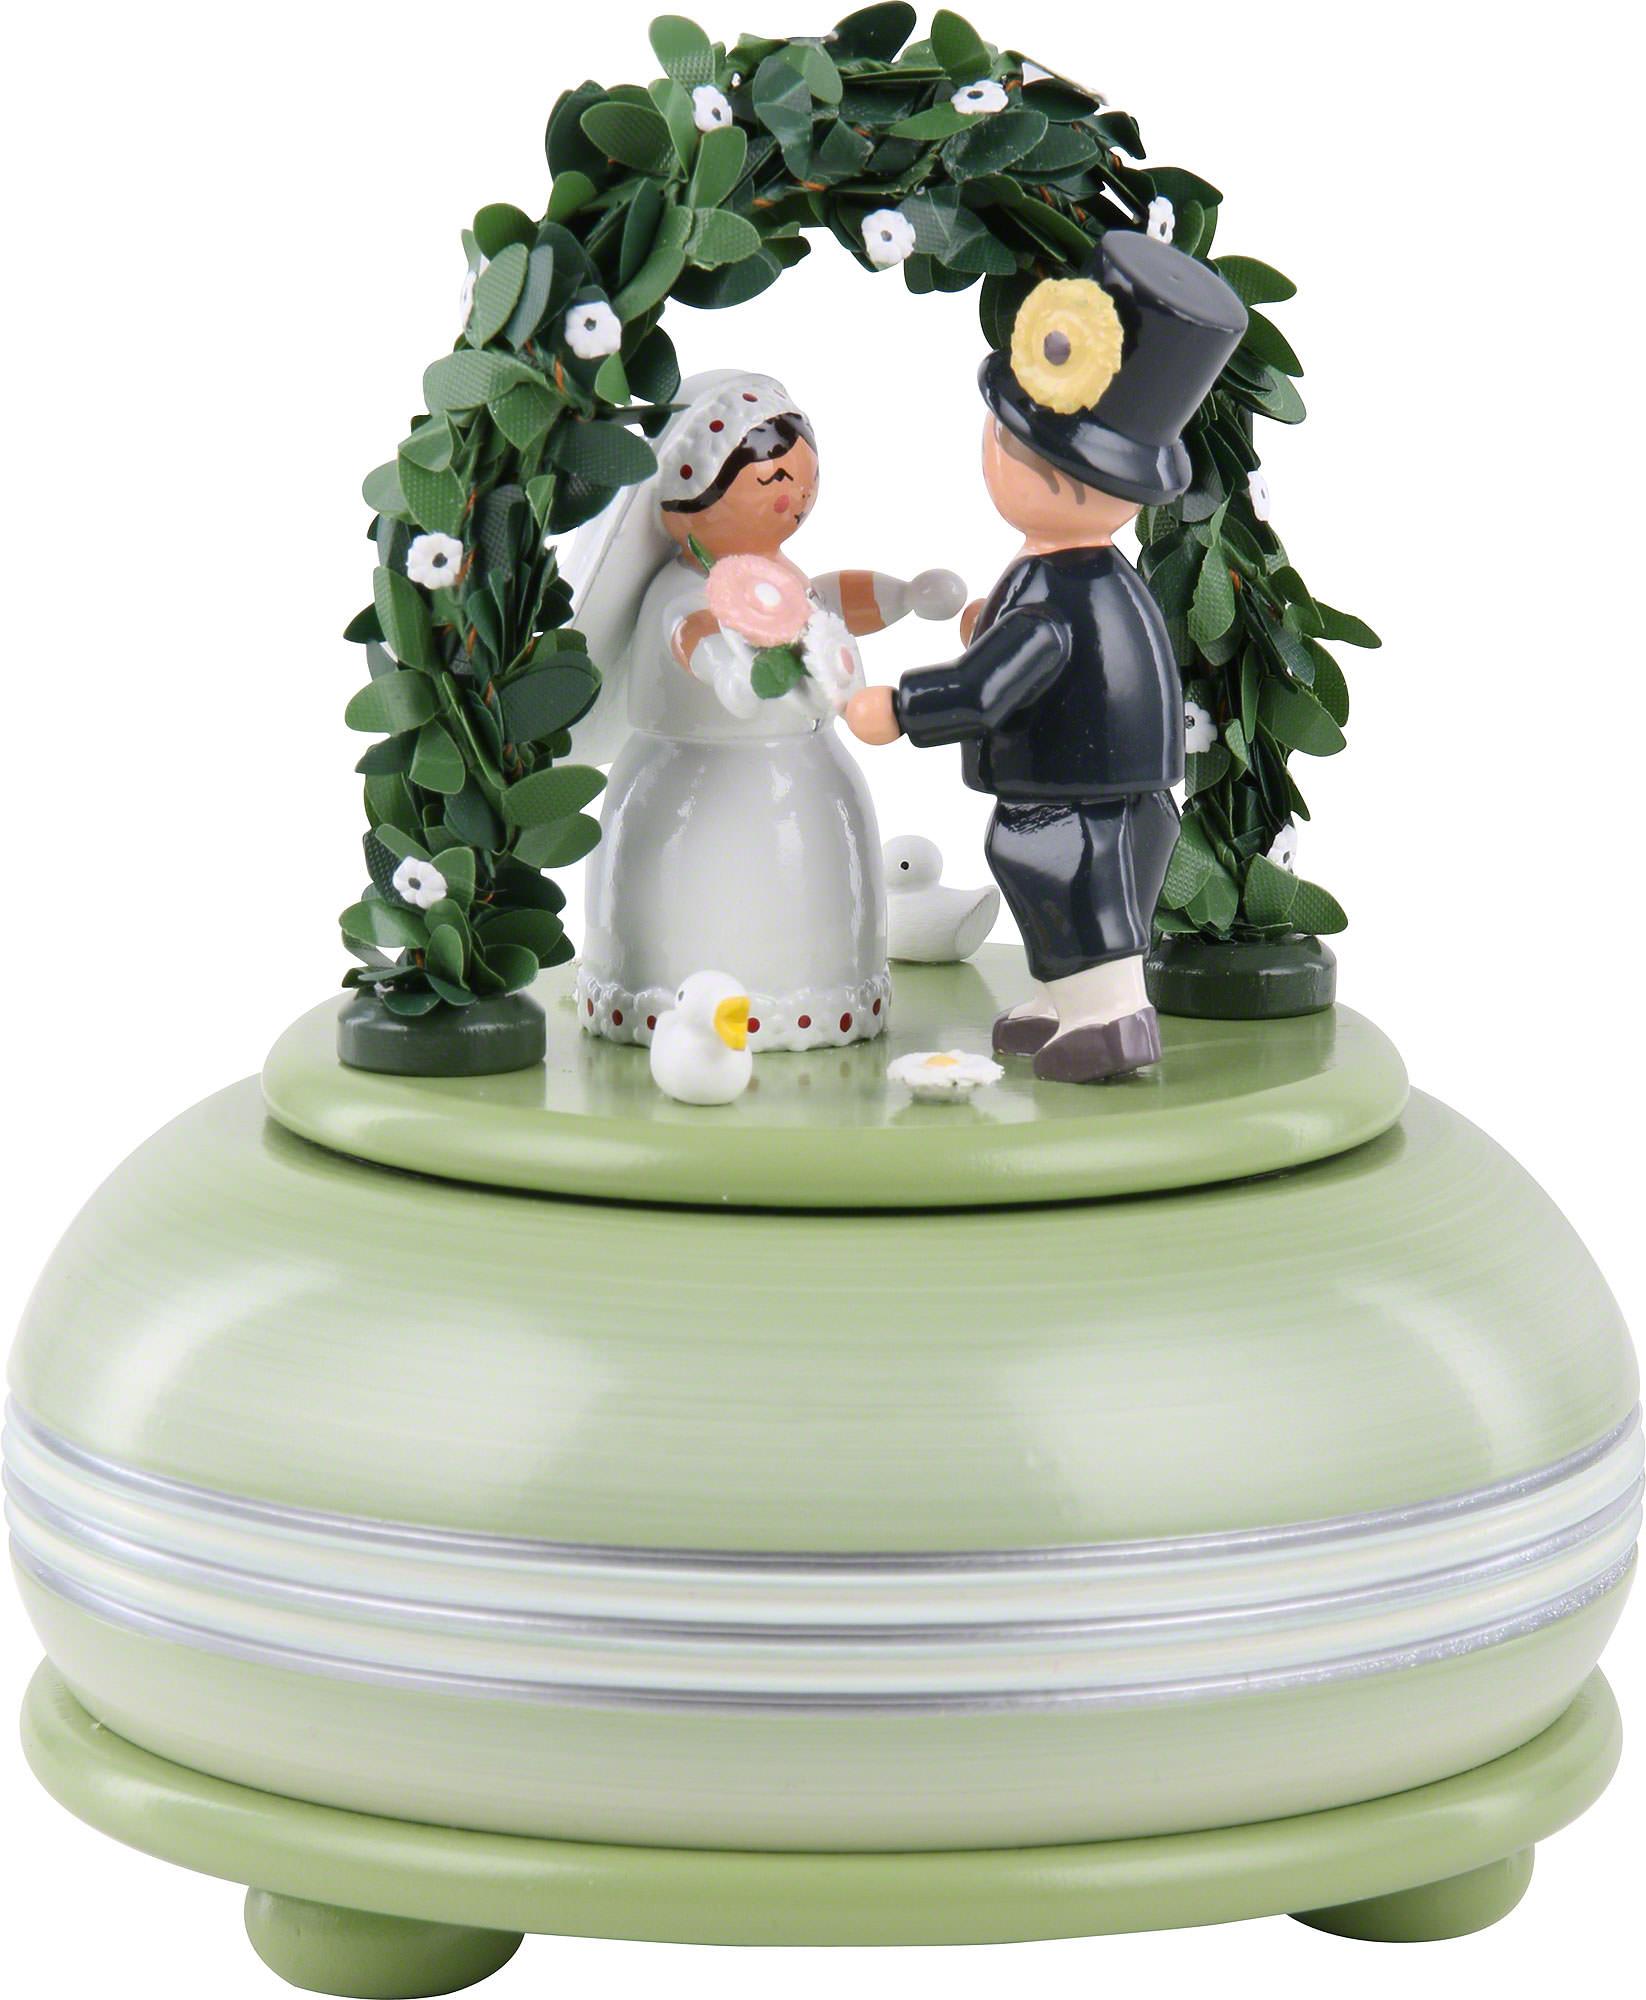 Wedding Music Box Gift: Music Box Wedding (15 Cm/5.9in) By KWO